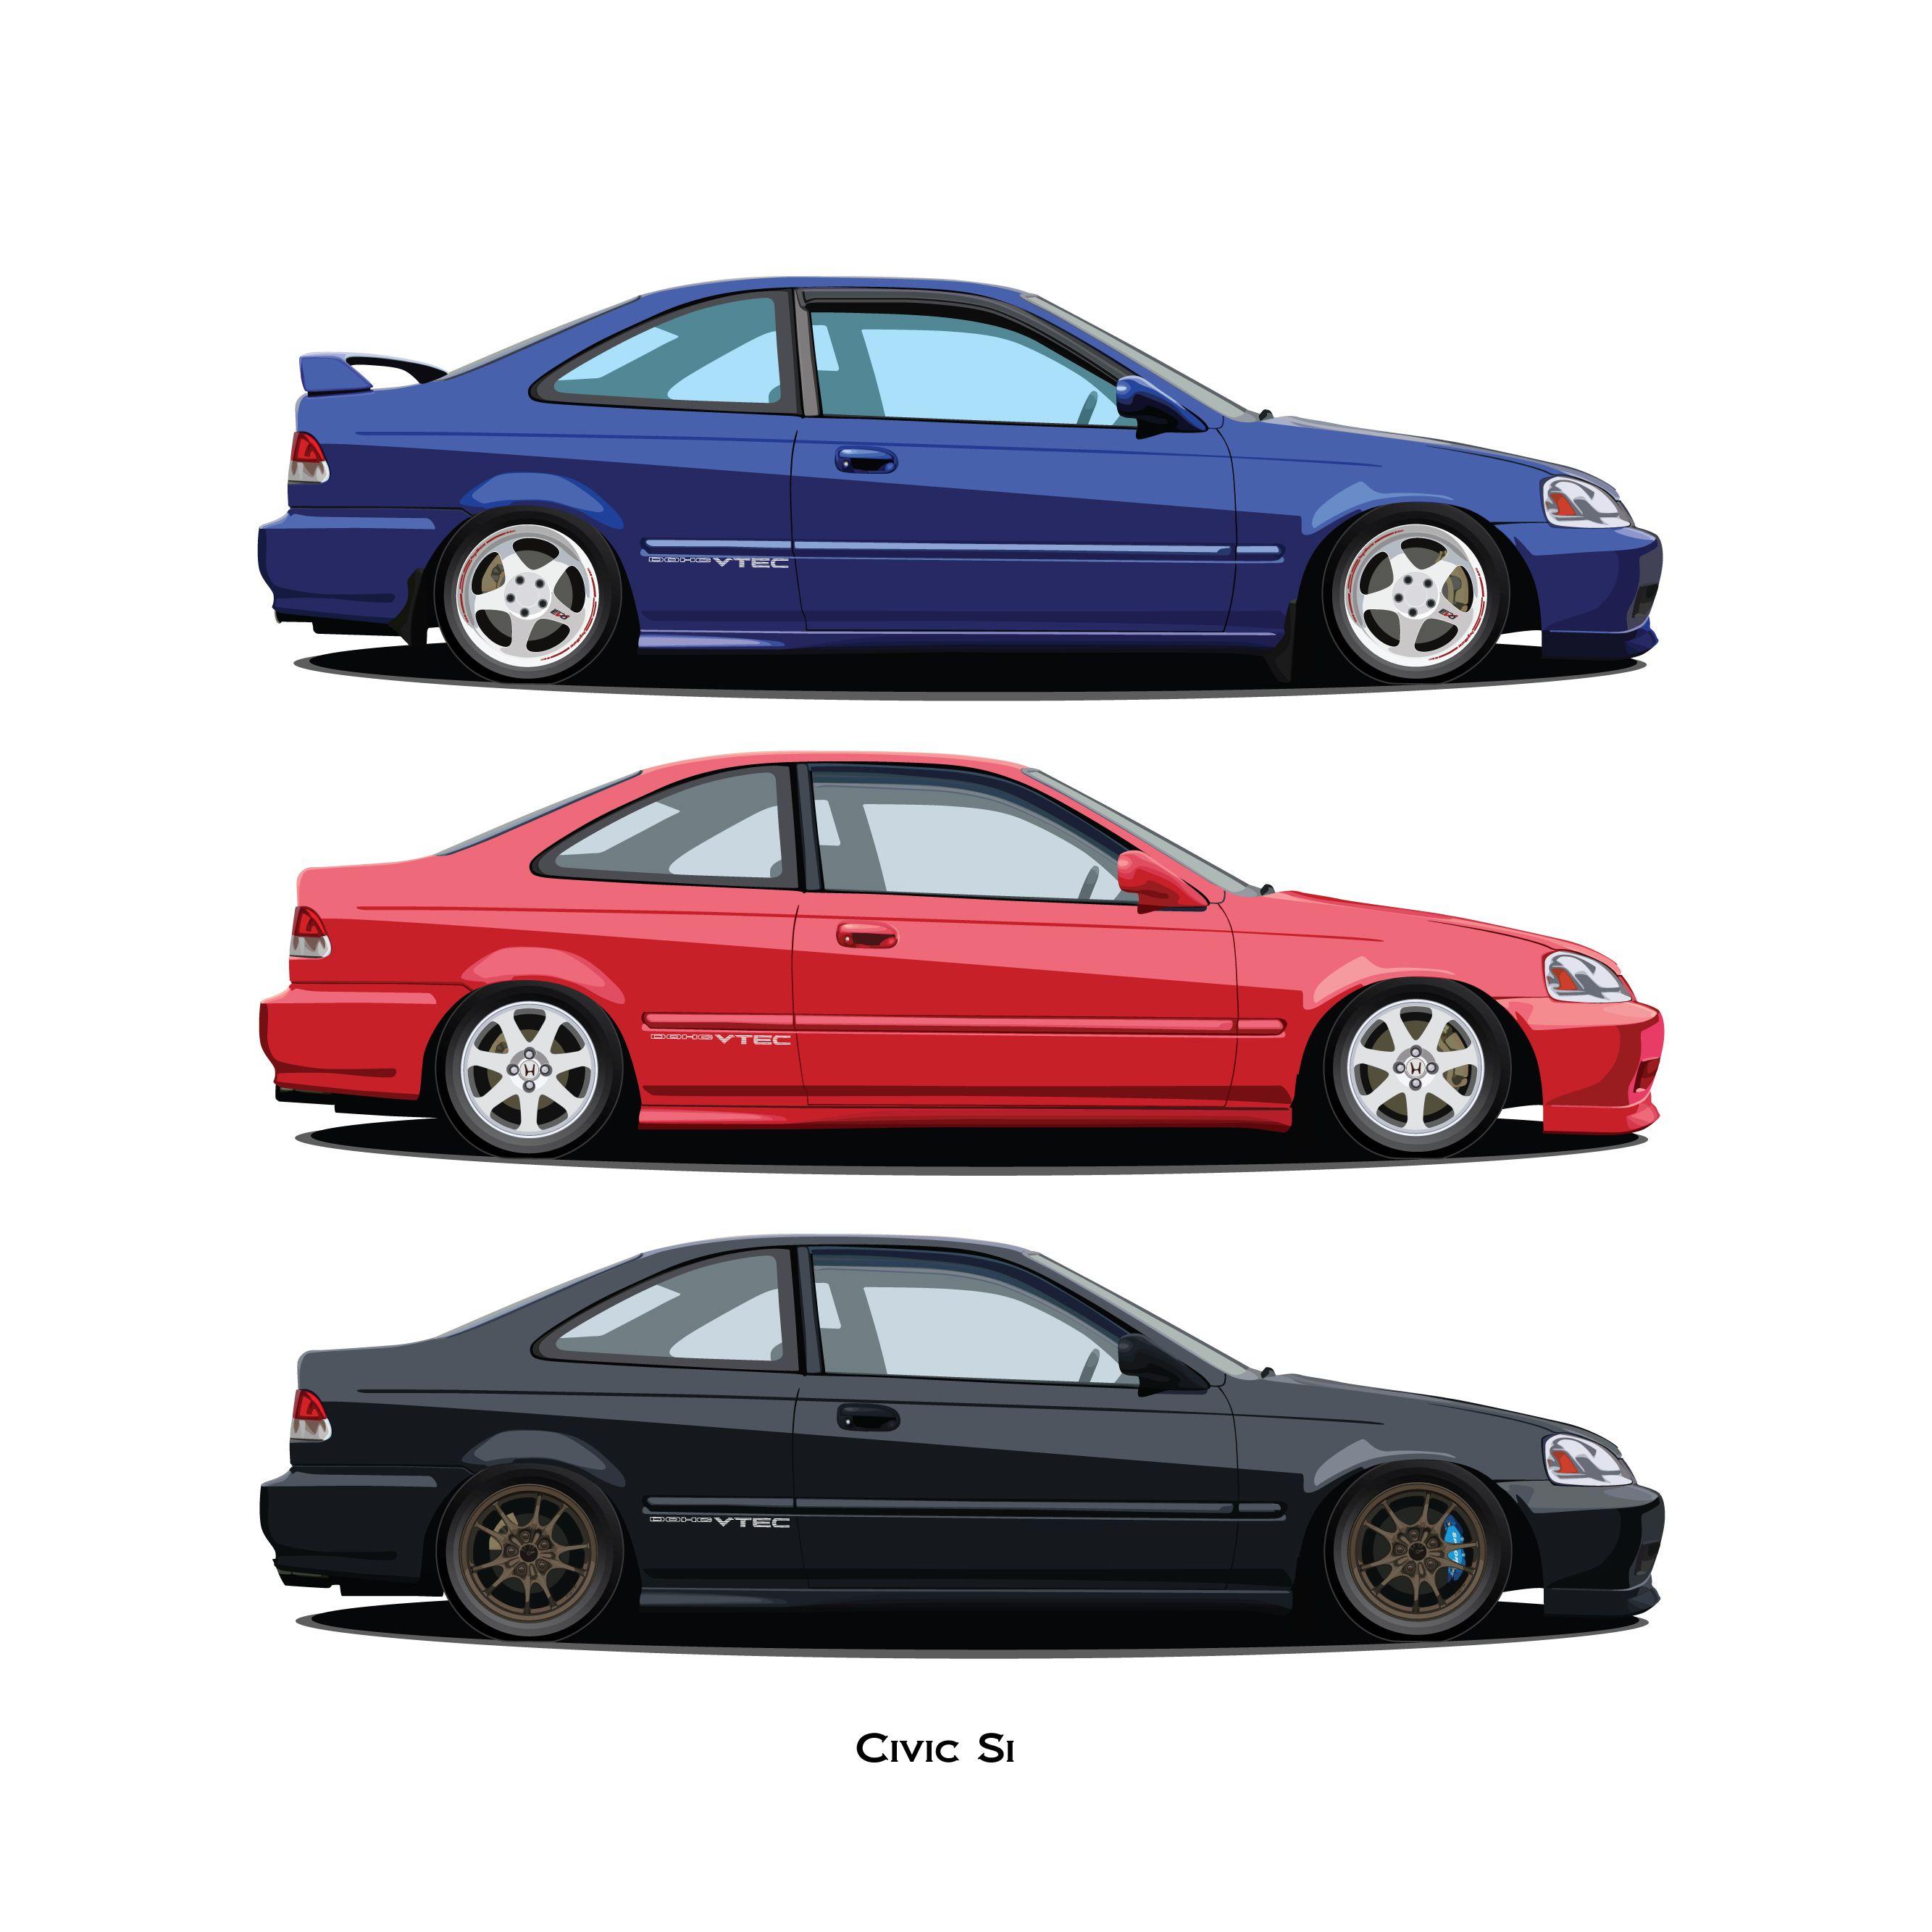 1999 Honda Civic Si And Friends Print